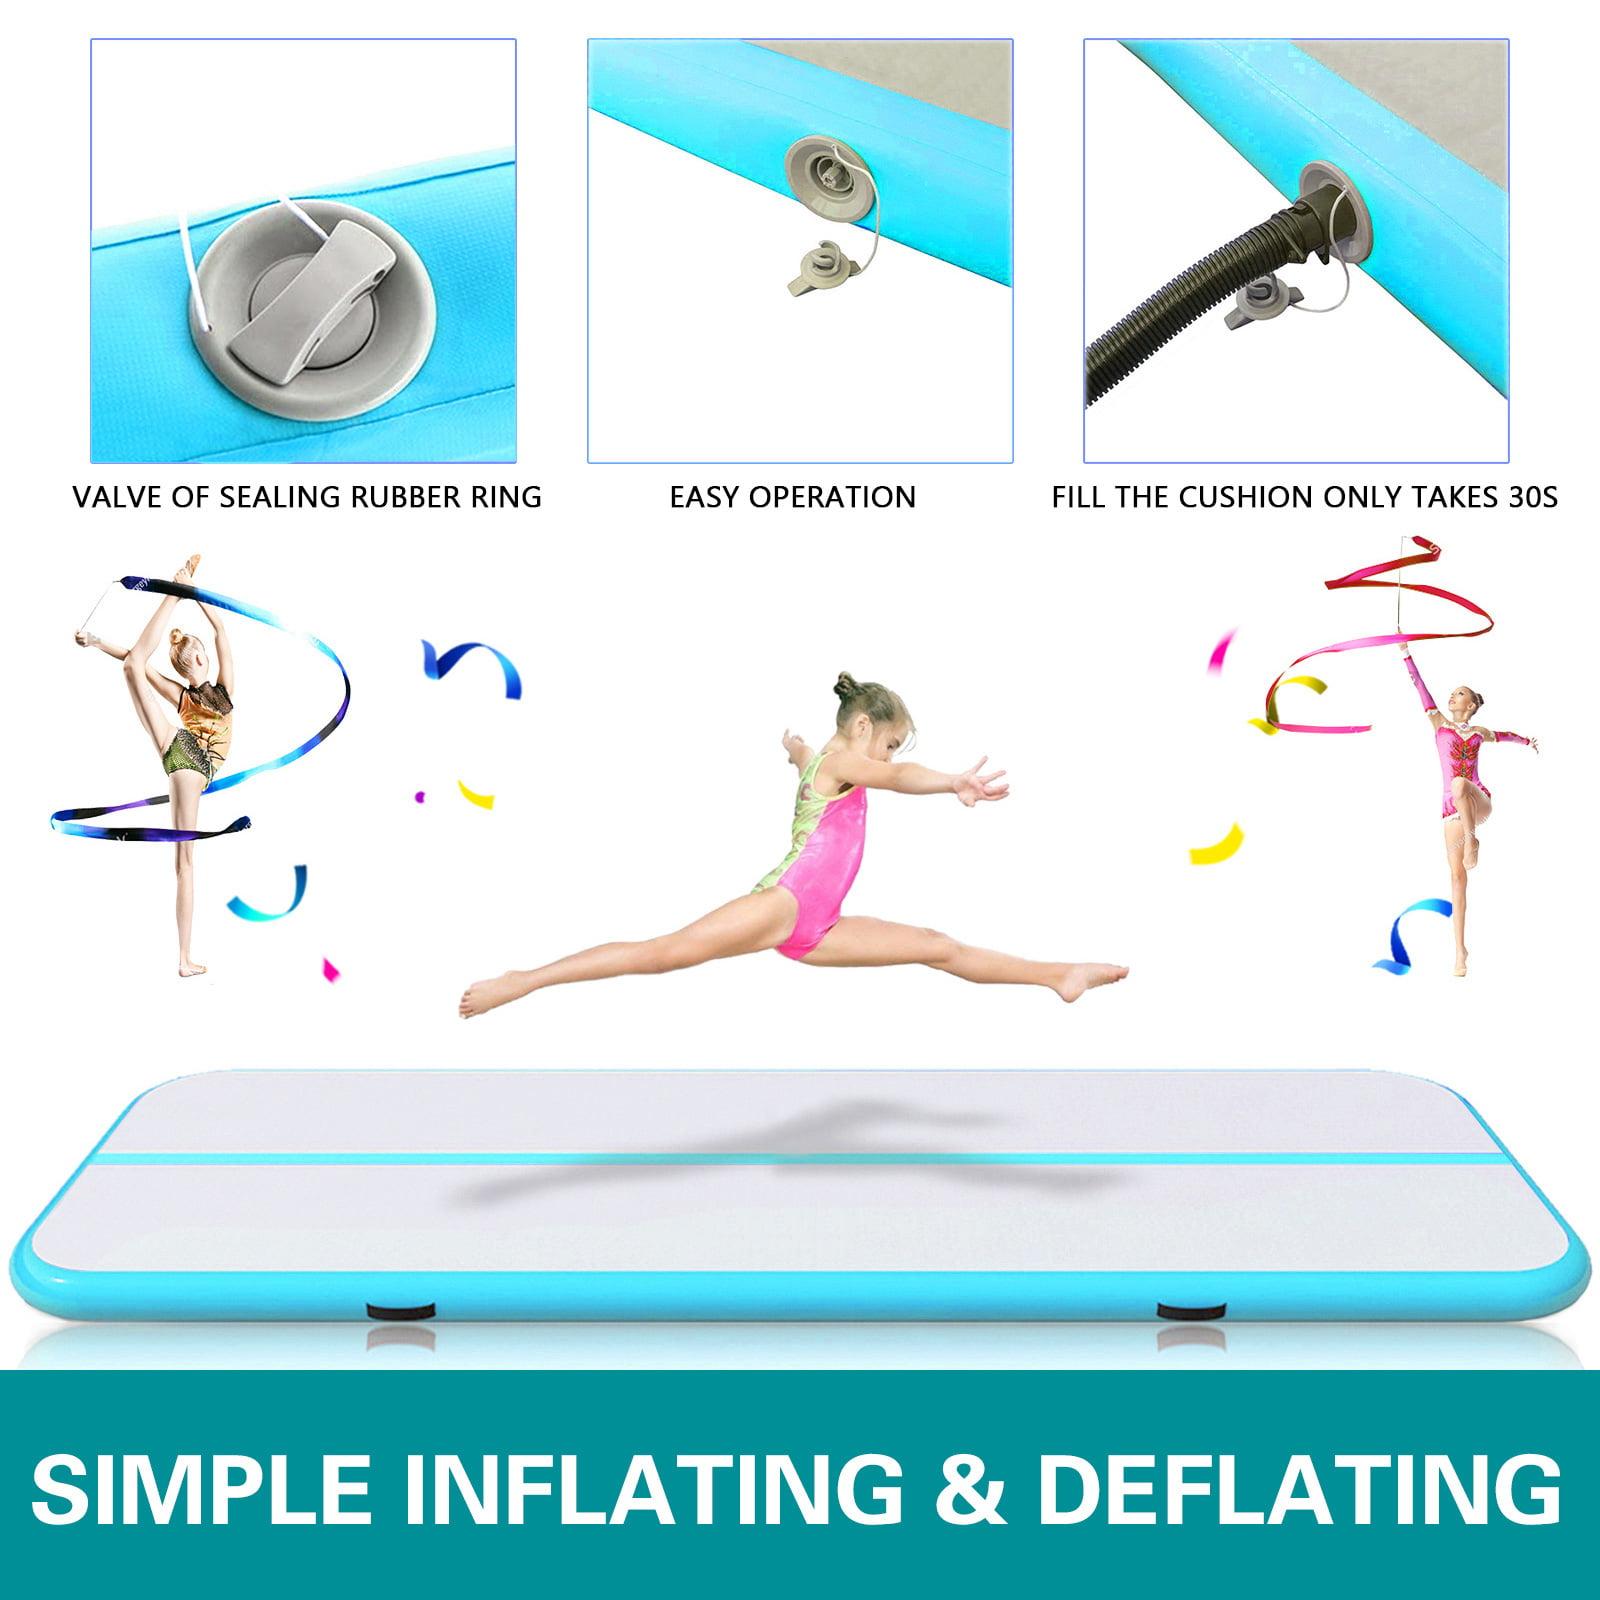 VEVOR 16FT Air Track Inflatable Airtrack Tumbling Gymnastics Mats Cheerleading